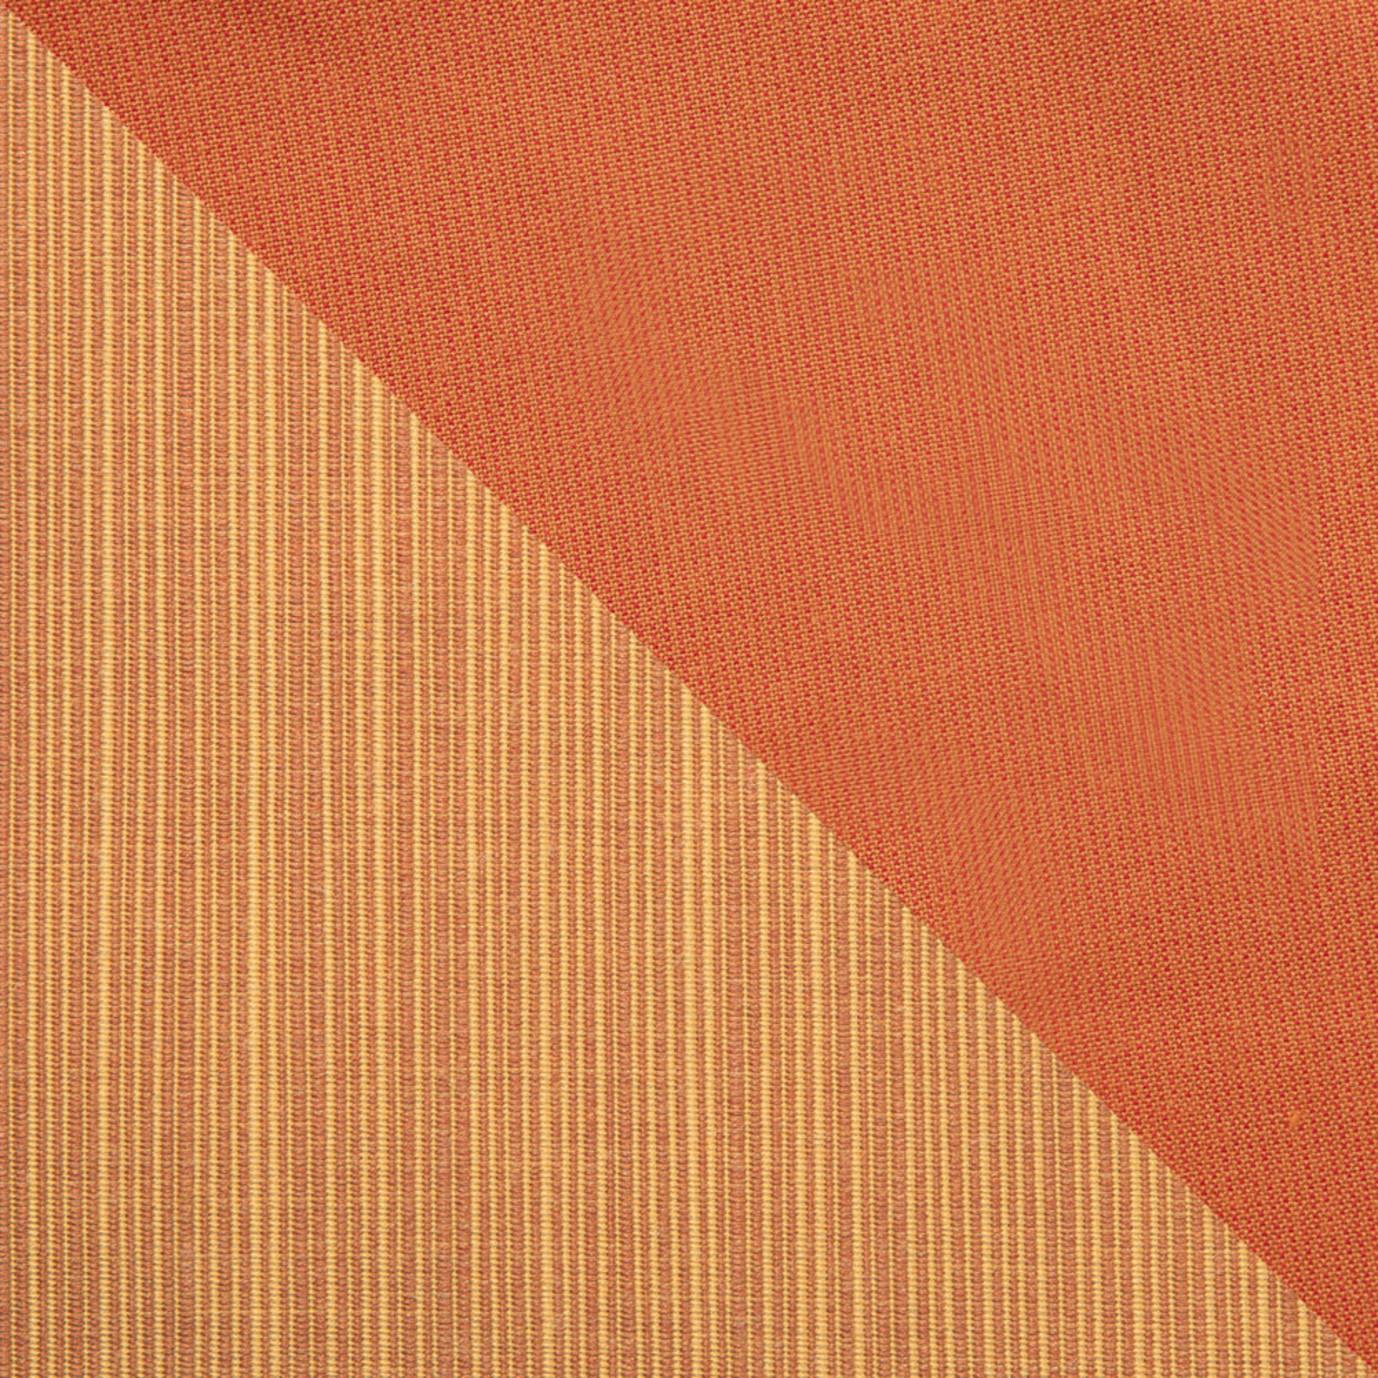 Cannes™ Armless Chairs - Tikka Orange